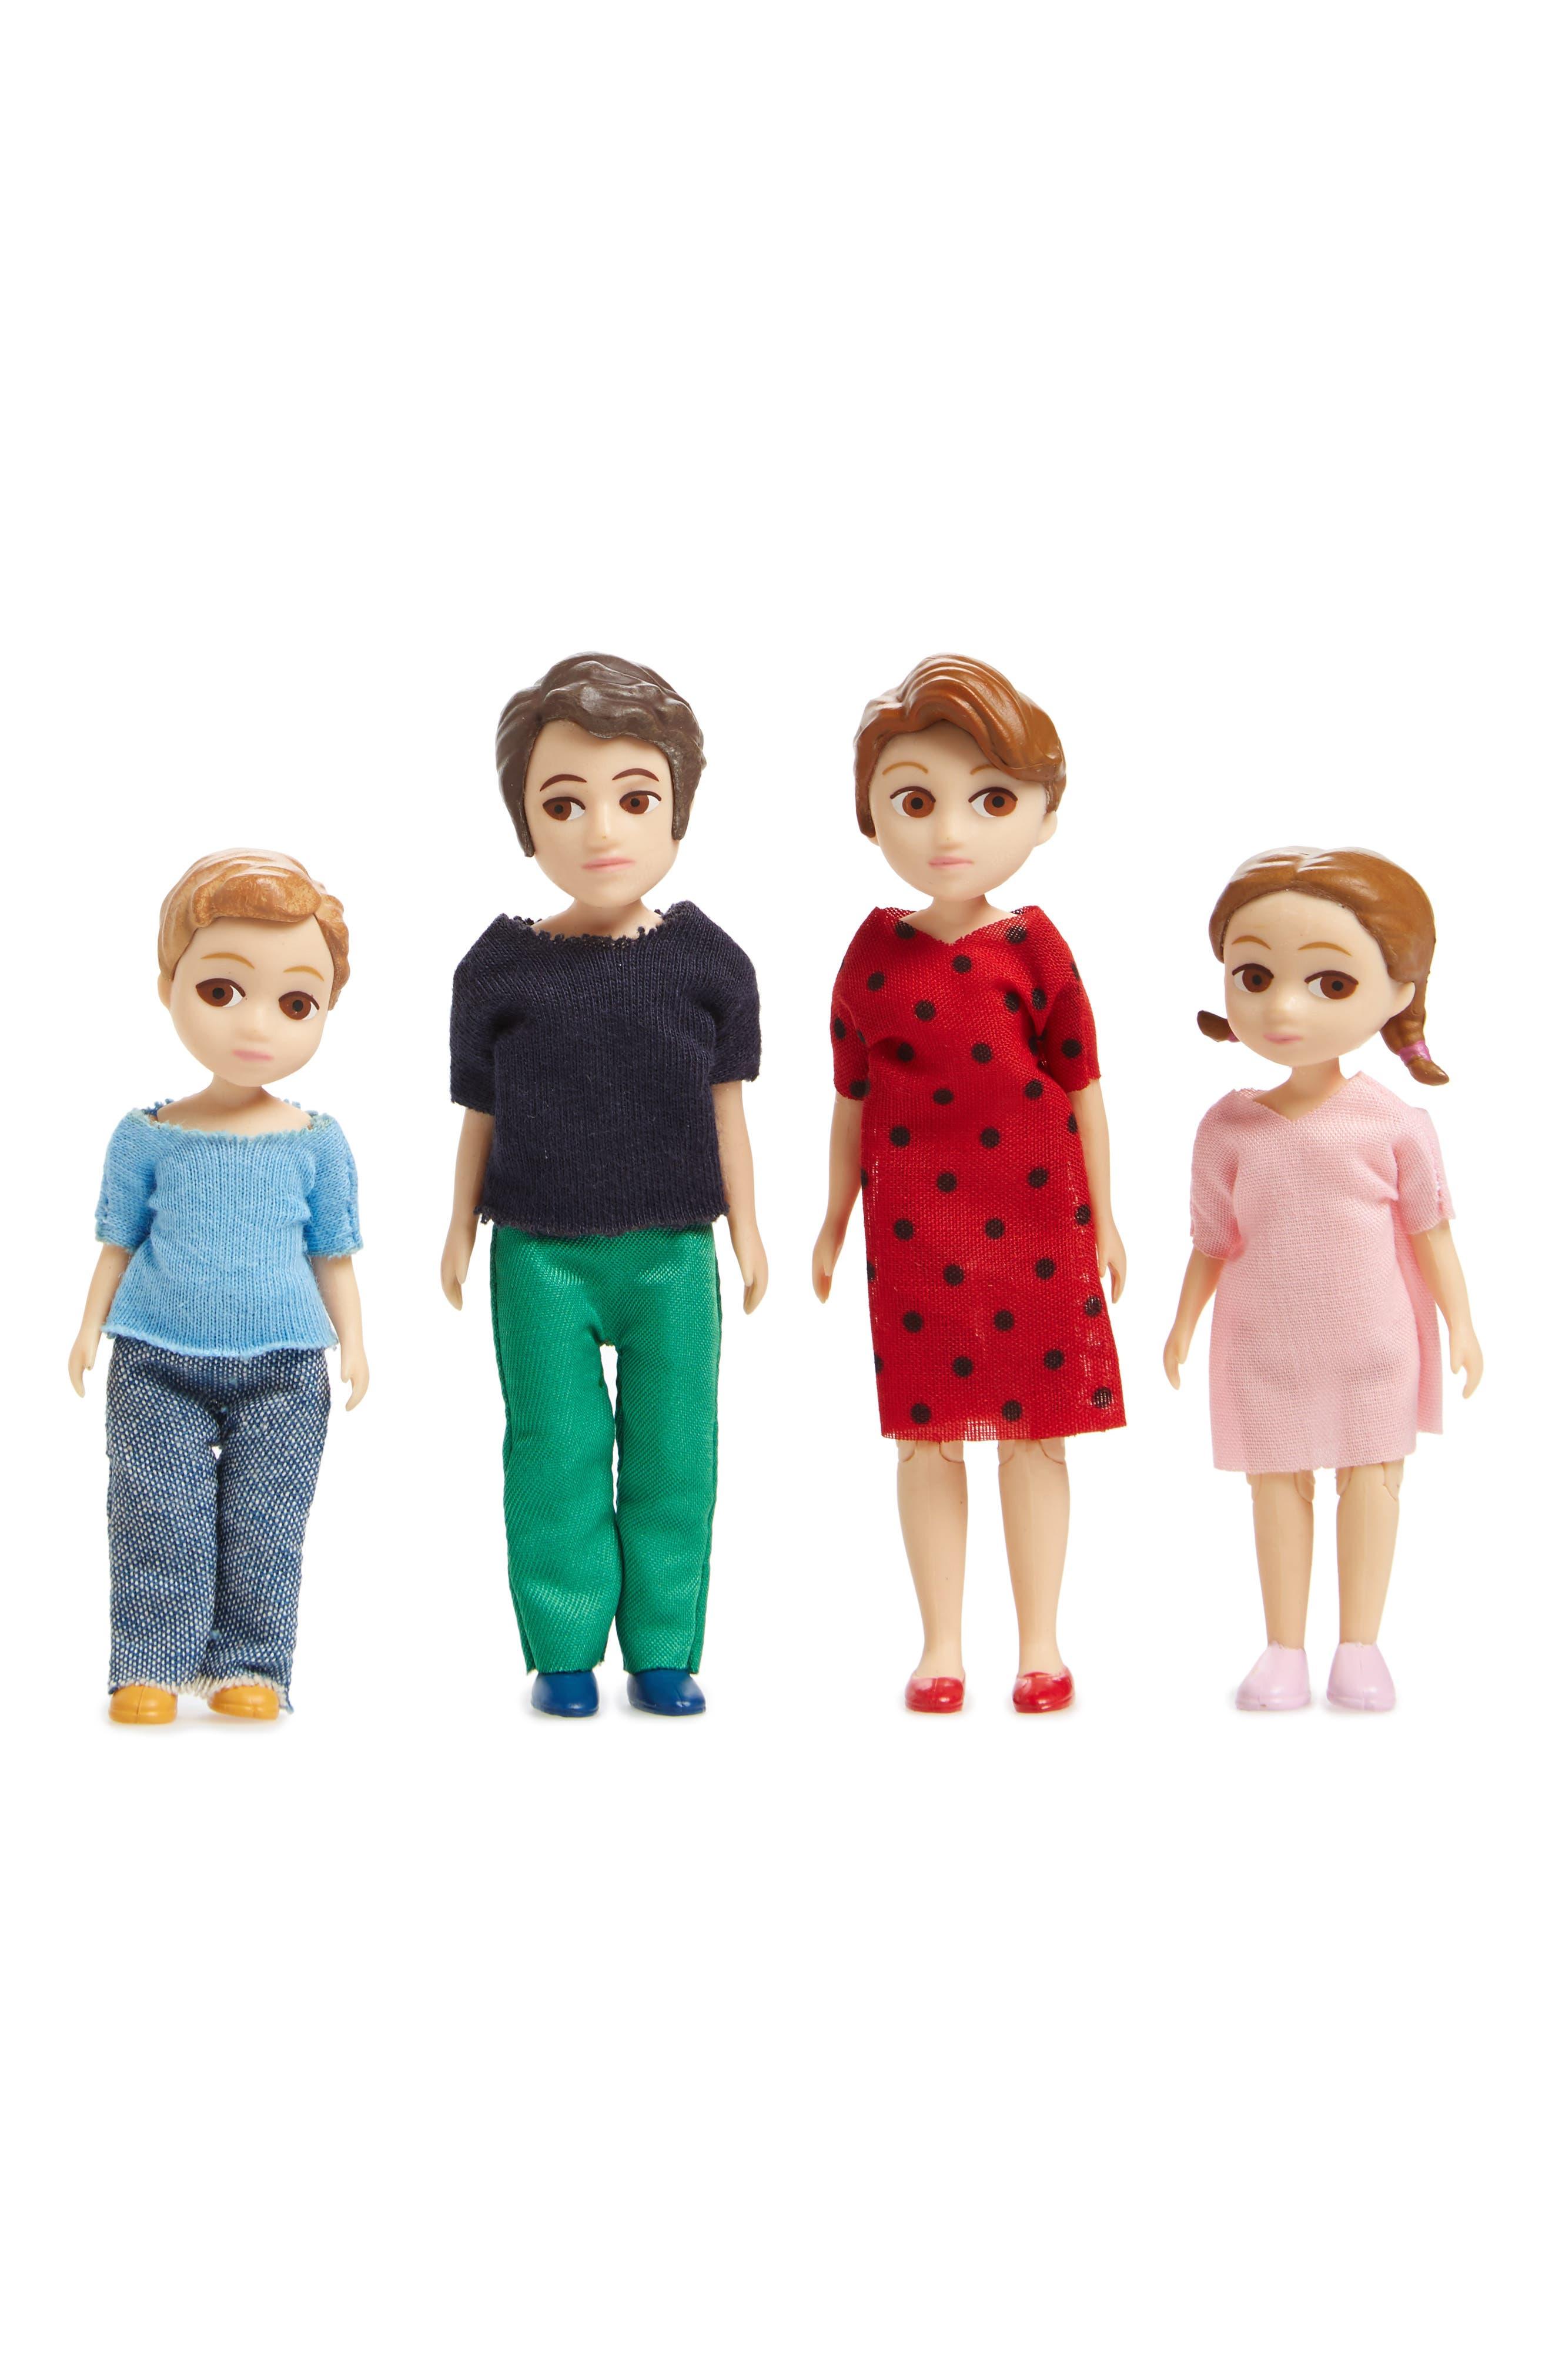 MoMA Design Store Thomas & Marion Family Set of 4 Dollhouse Dolls